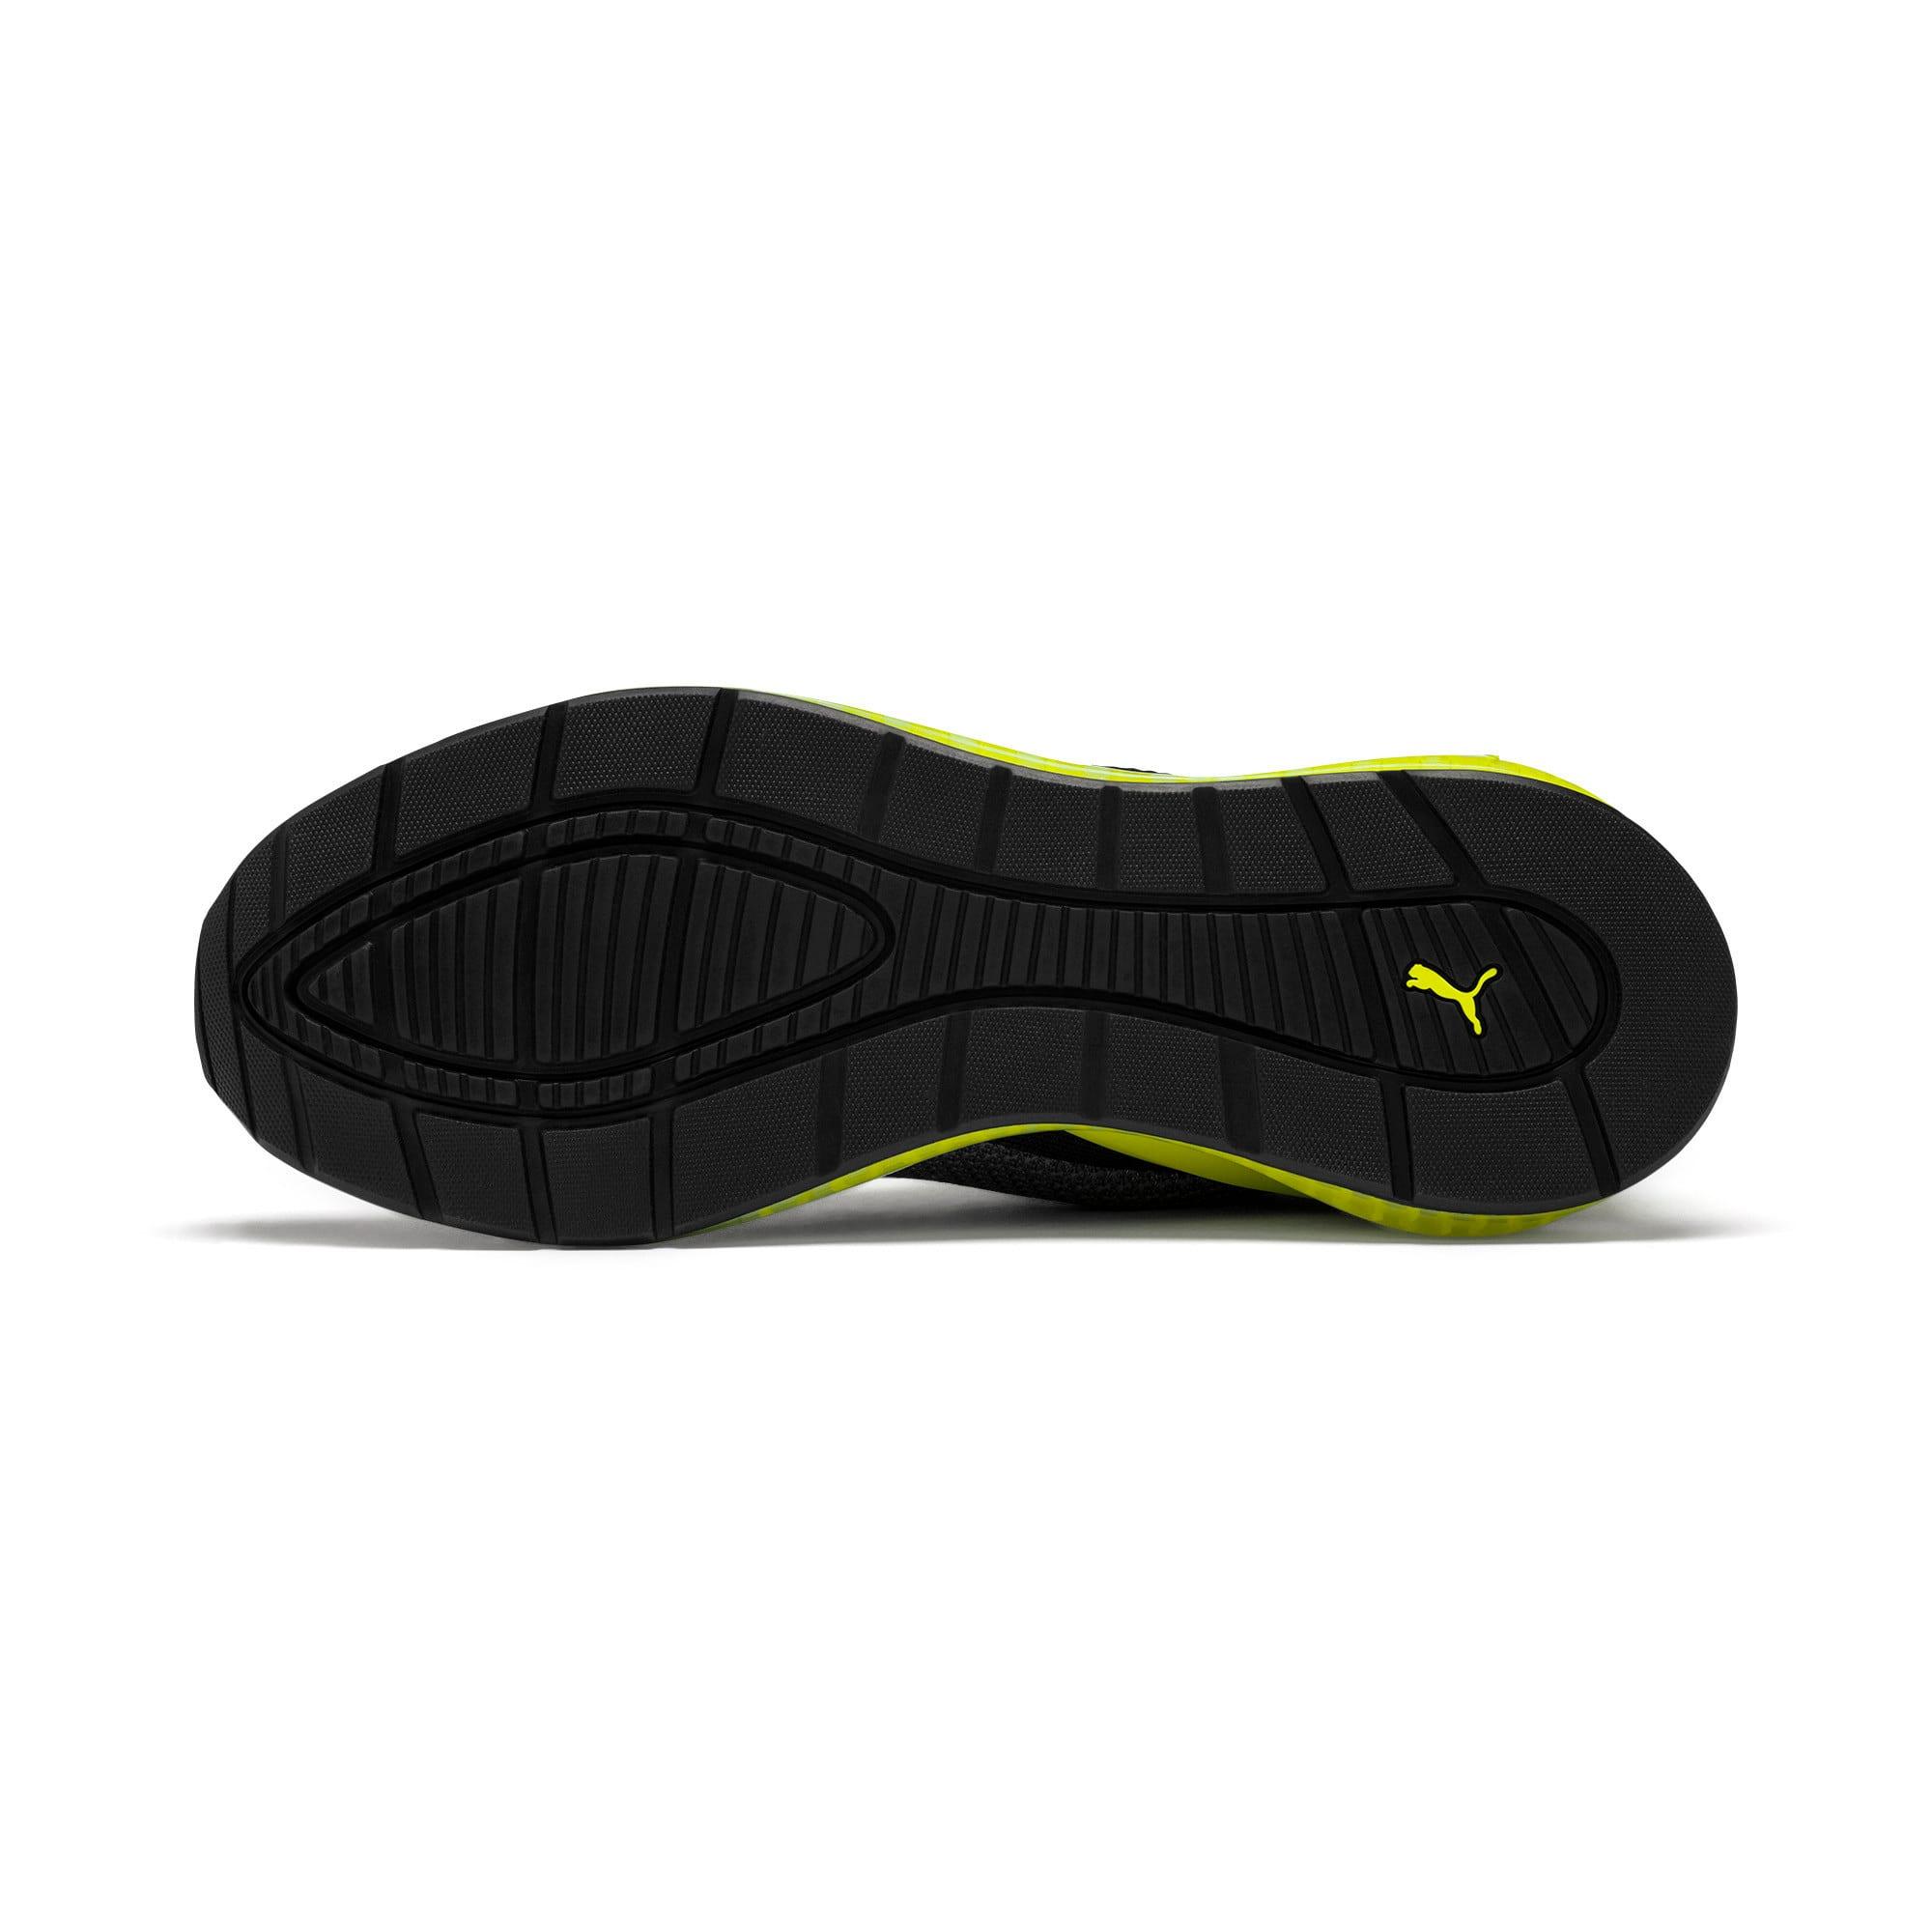 Thumbnail 4 of CELL Descend Weave Men's Training Shoes, CASTLEROCK-Black-Yellow, medium